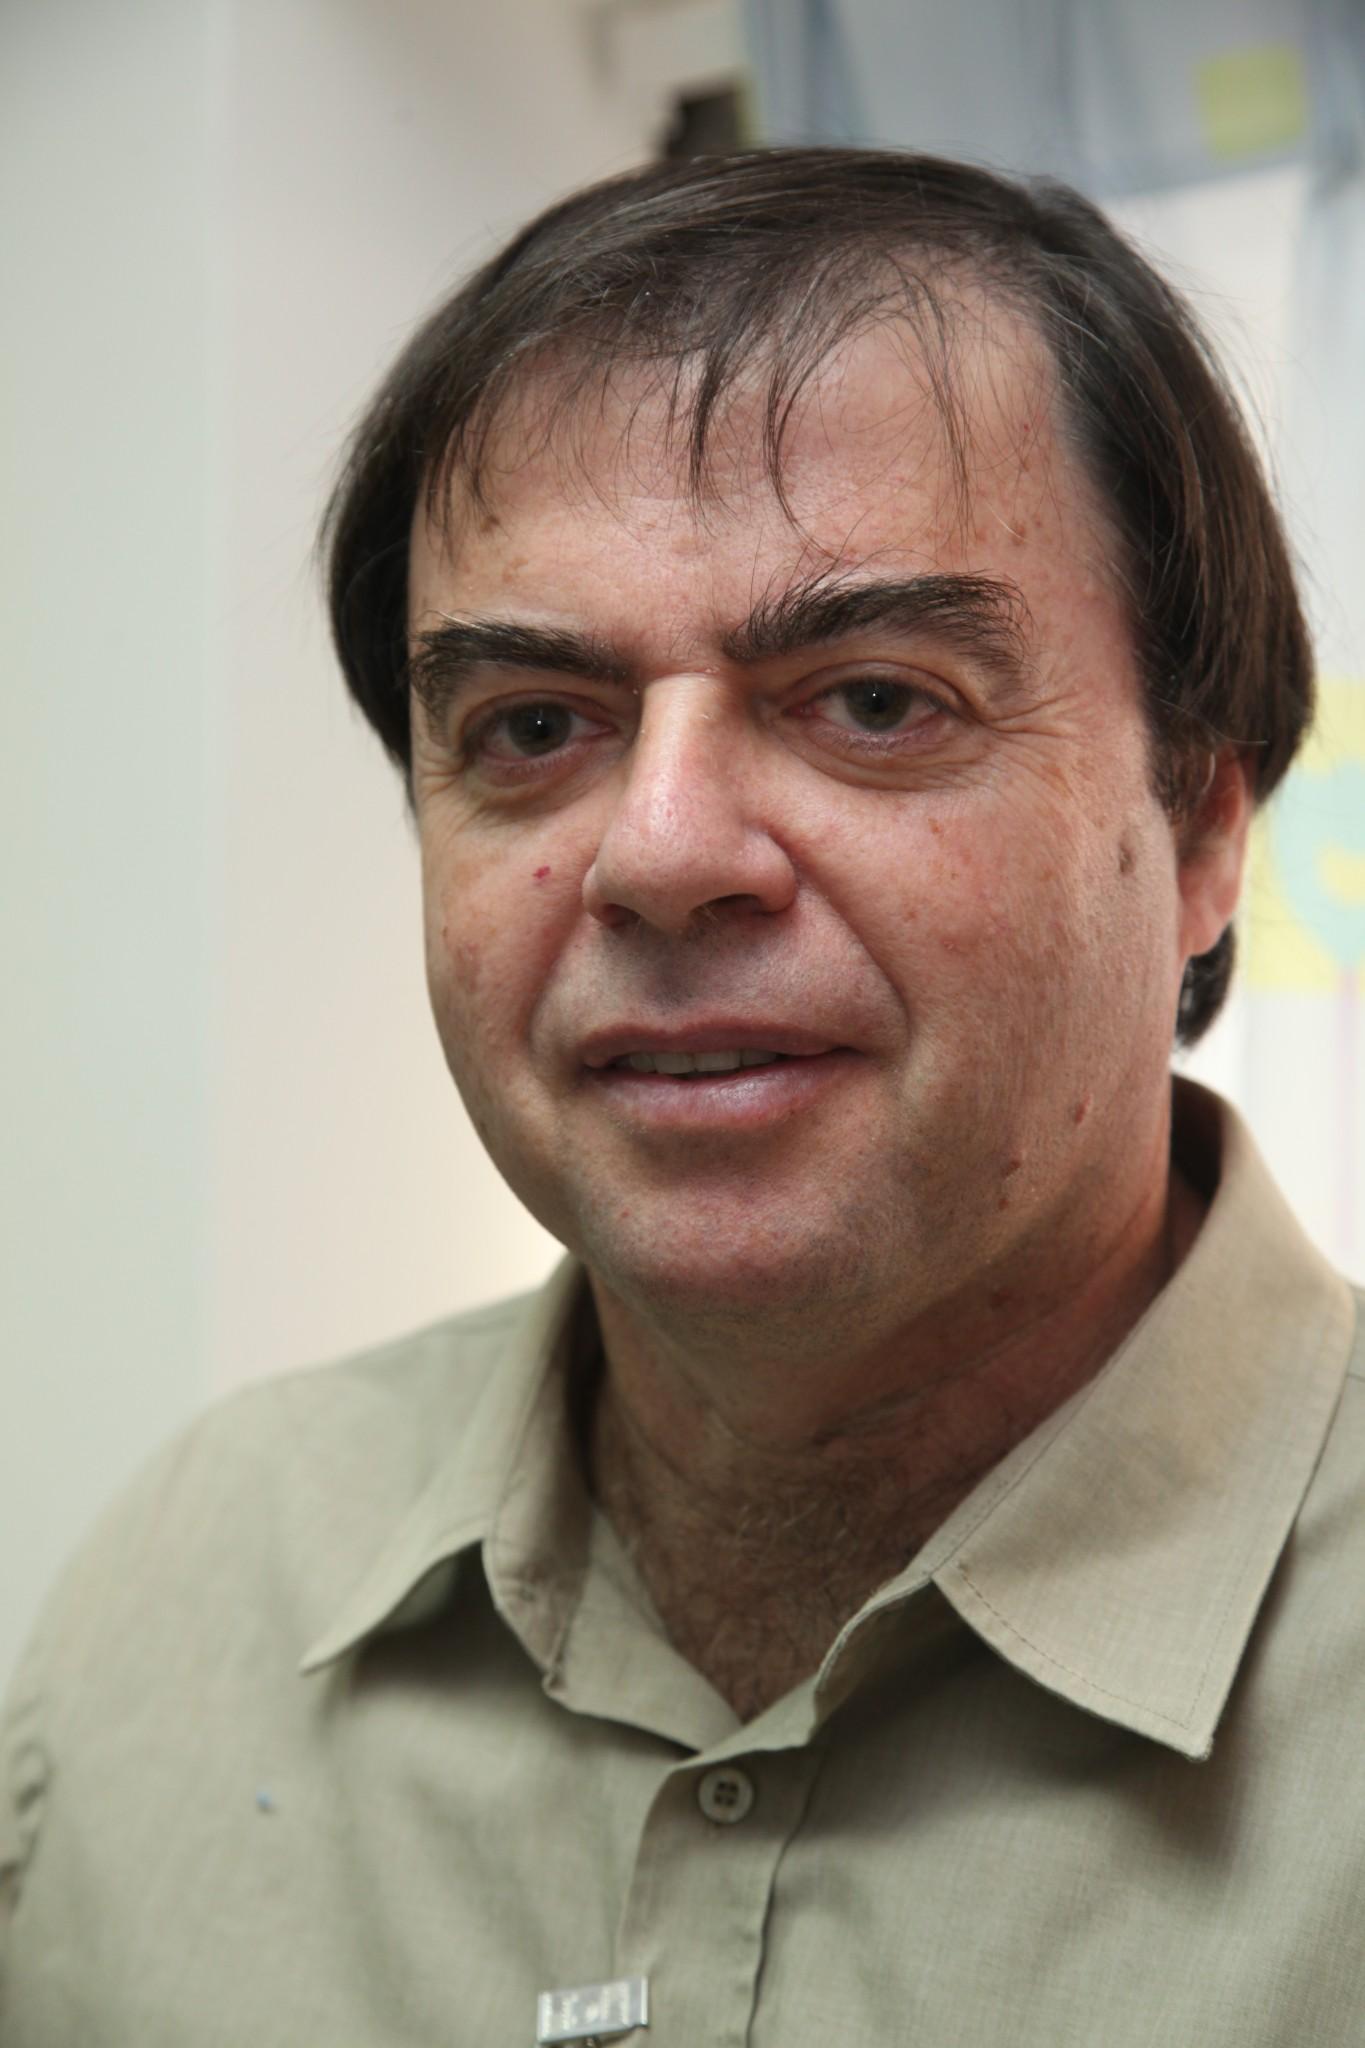 Professor Eran Ben-Arye. Photo by Office of the spokesperson, Technion